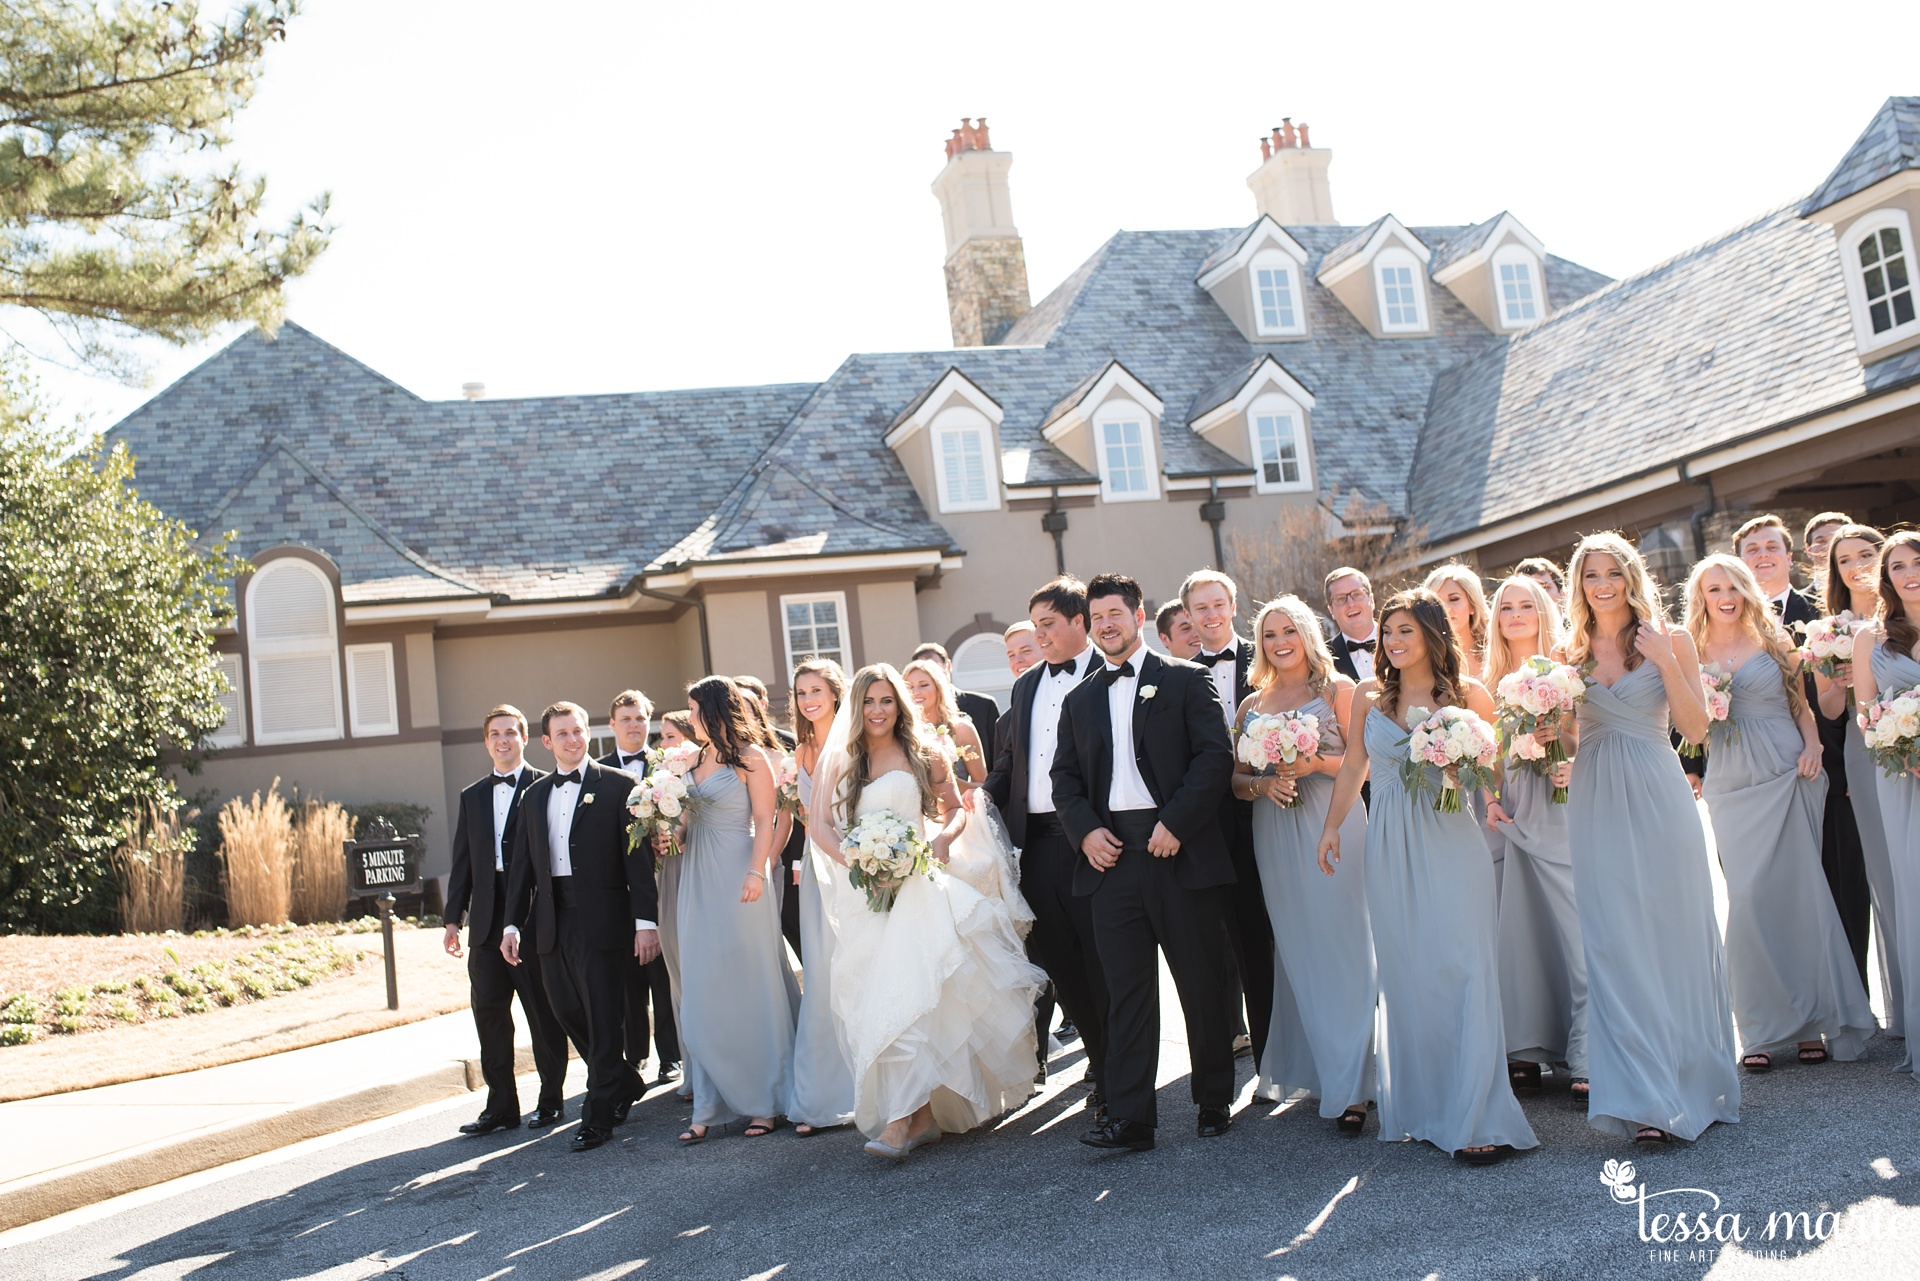 tessa_marie_legacy_moments_storytelling_candid_emotionally_driven_wedding_photographer_atlanta_wedding_photography_st_ives_country_club_wedding_boukates_bridals_by_lori_0022